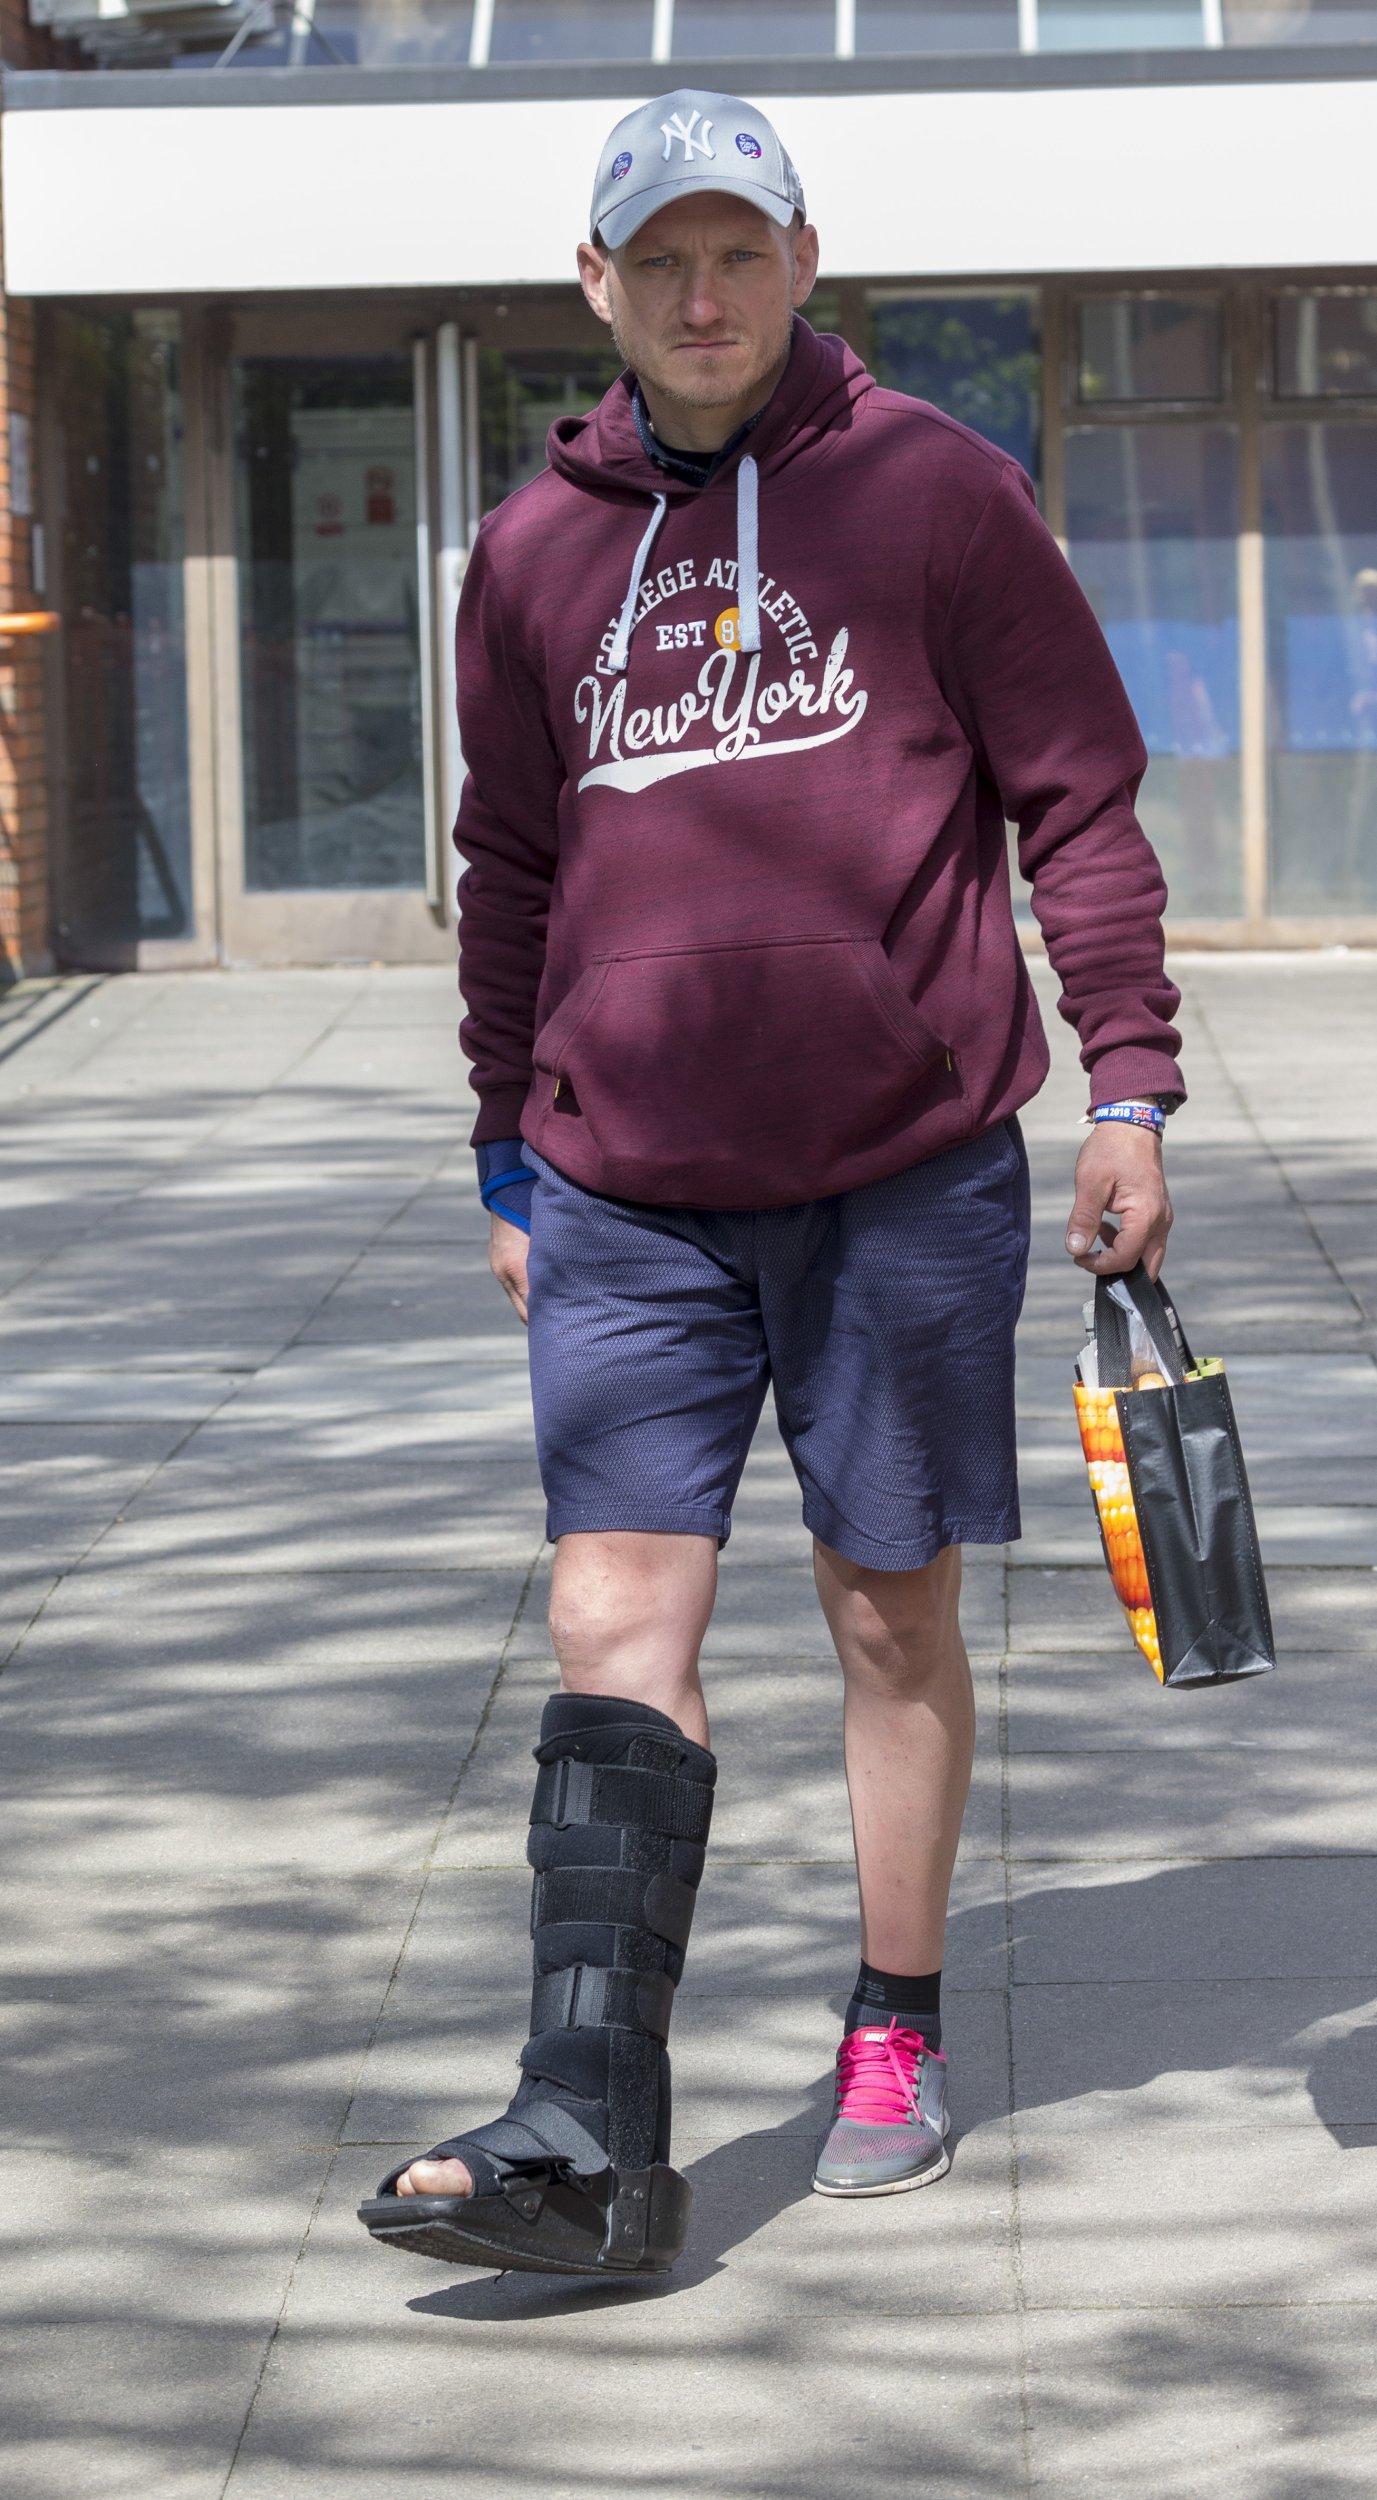 Pic Doug Seeburg - London marathon cheat Stanley Skupien leaves Uxbridge mags court. (Picture: Doug Seeburg/The Sun/News Licensing)